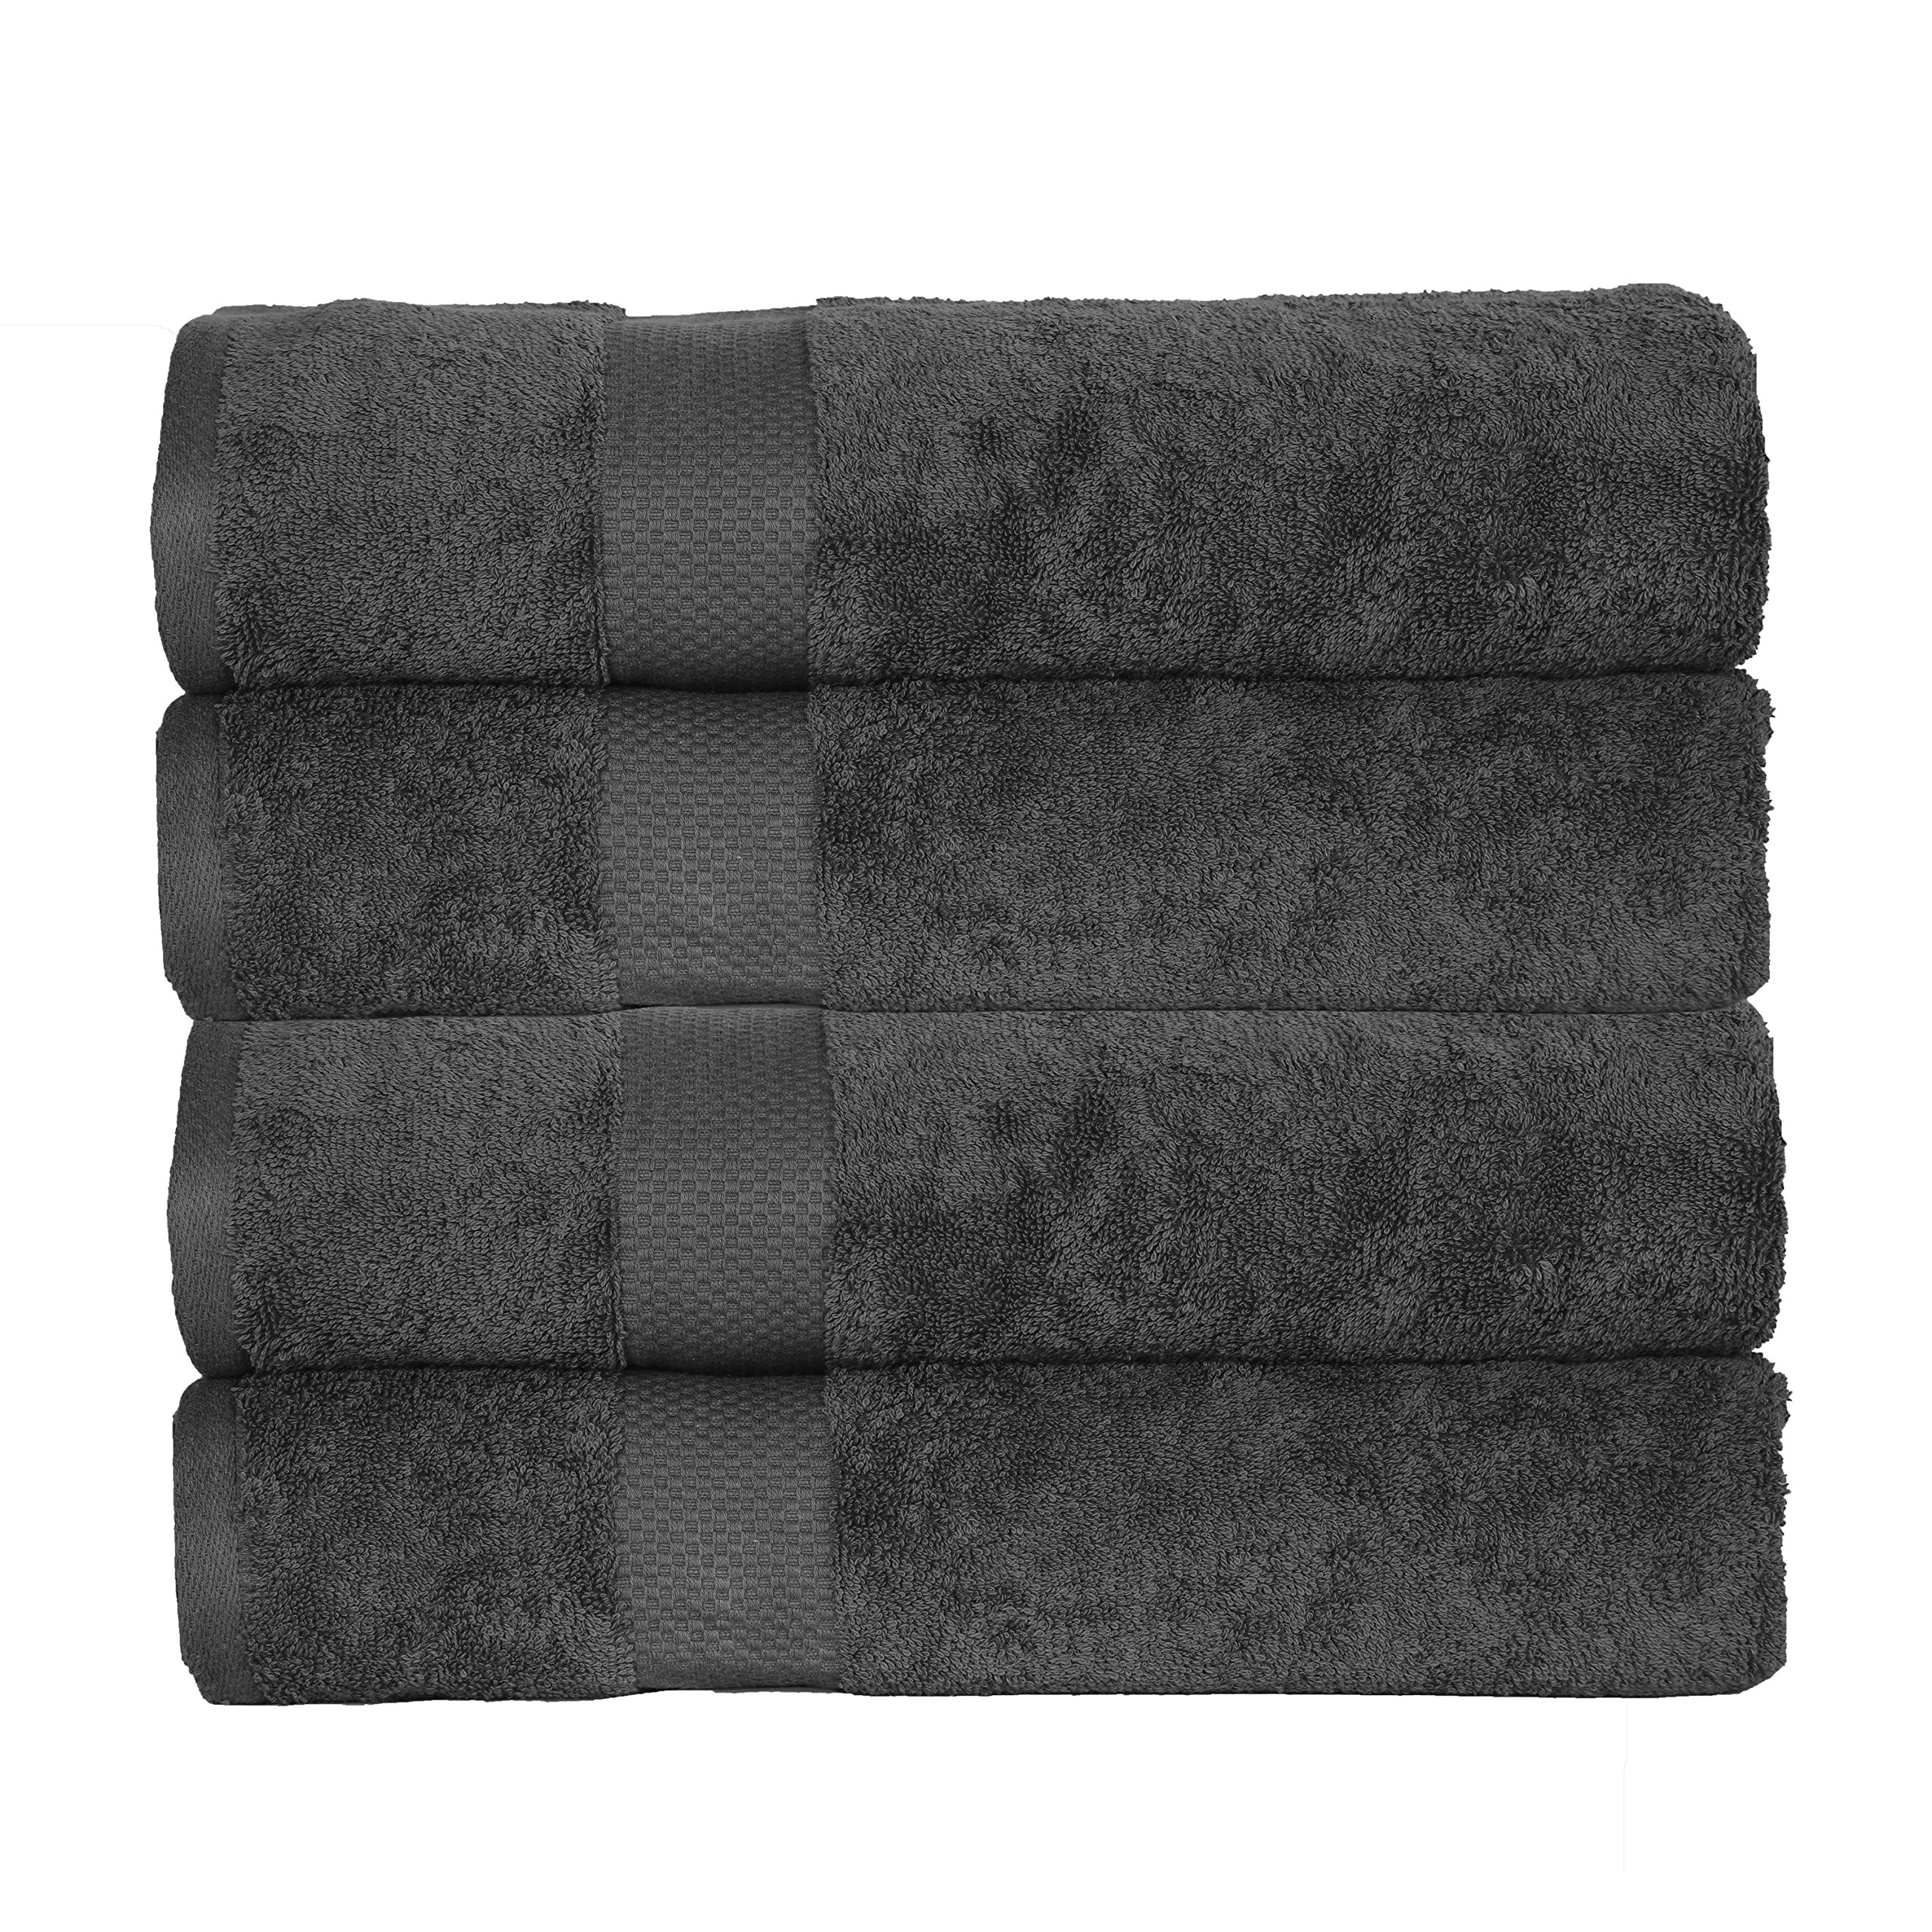 Casa Platino Elegance Spa ESP4 100% Combed Cotton Oversized 4 Piece Bath Sheets, Charcoal